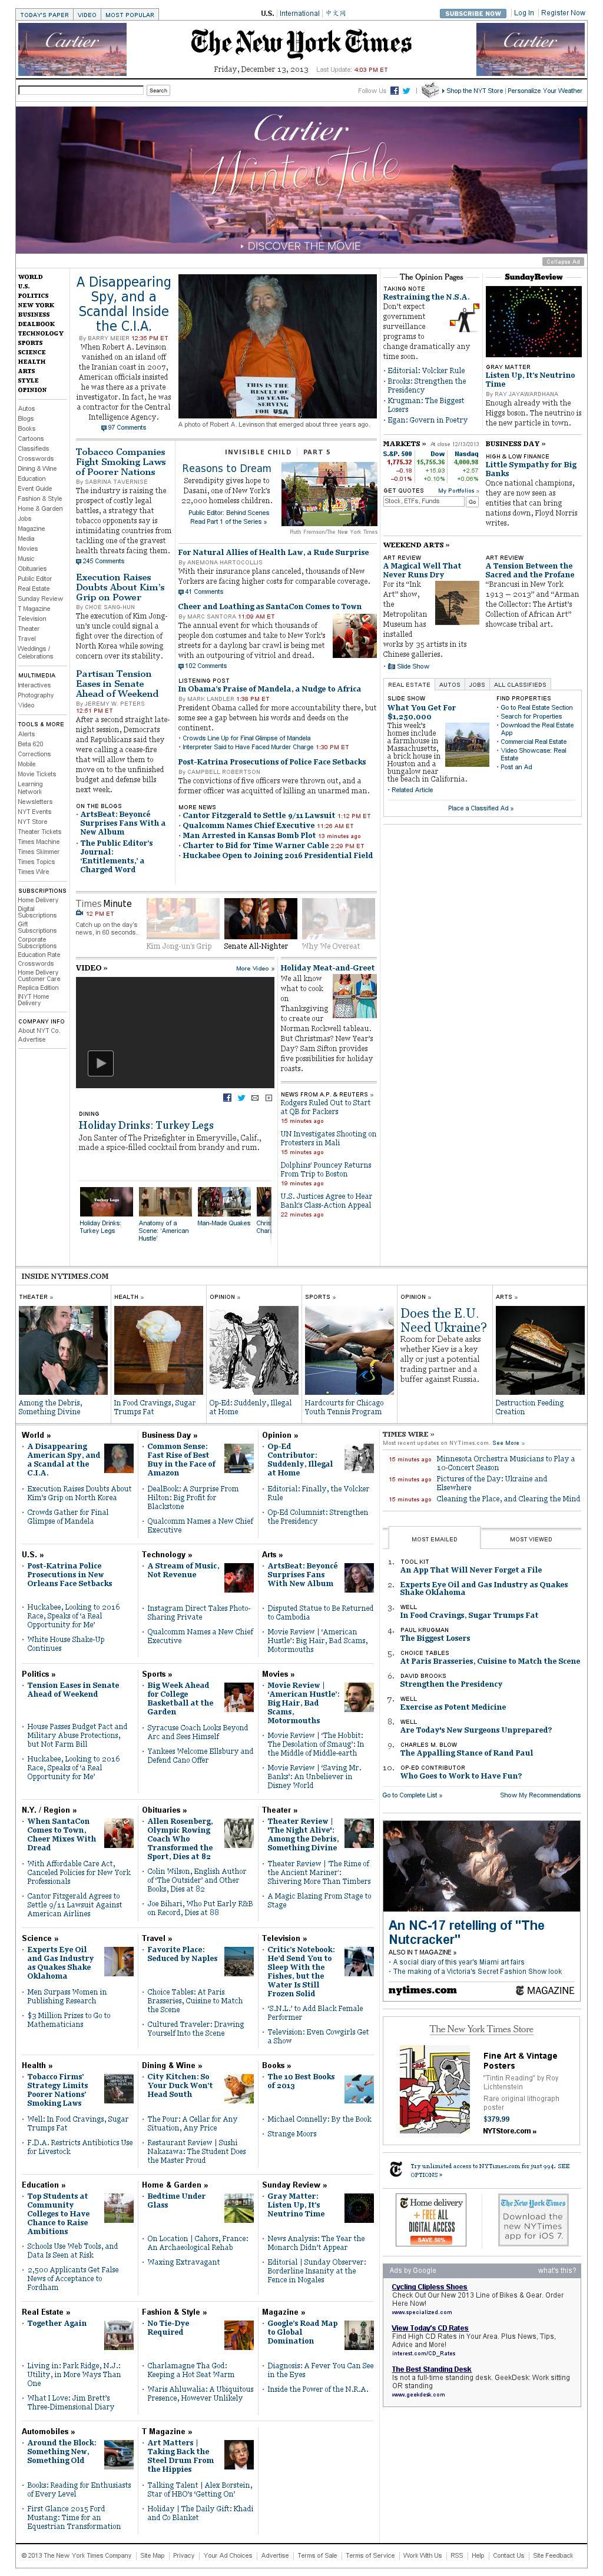 The New York Times at Friday Dec. 13, 2013, 9:11 p.m. UTC